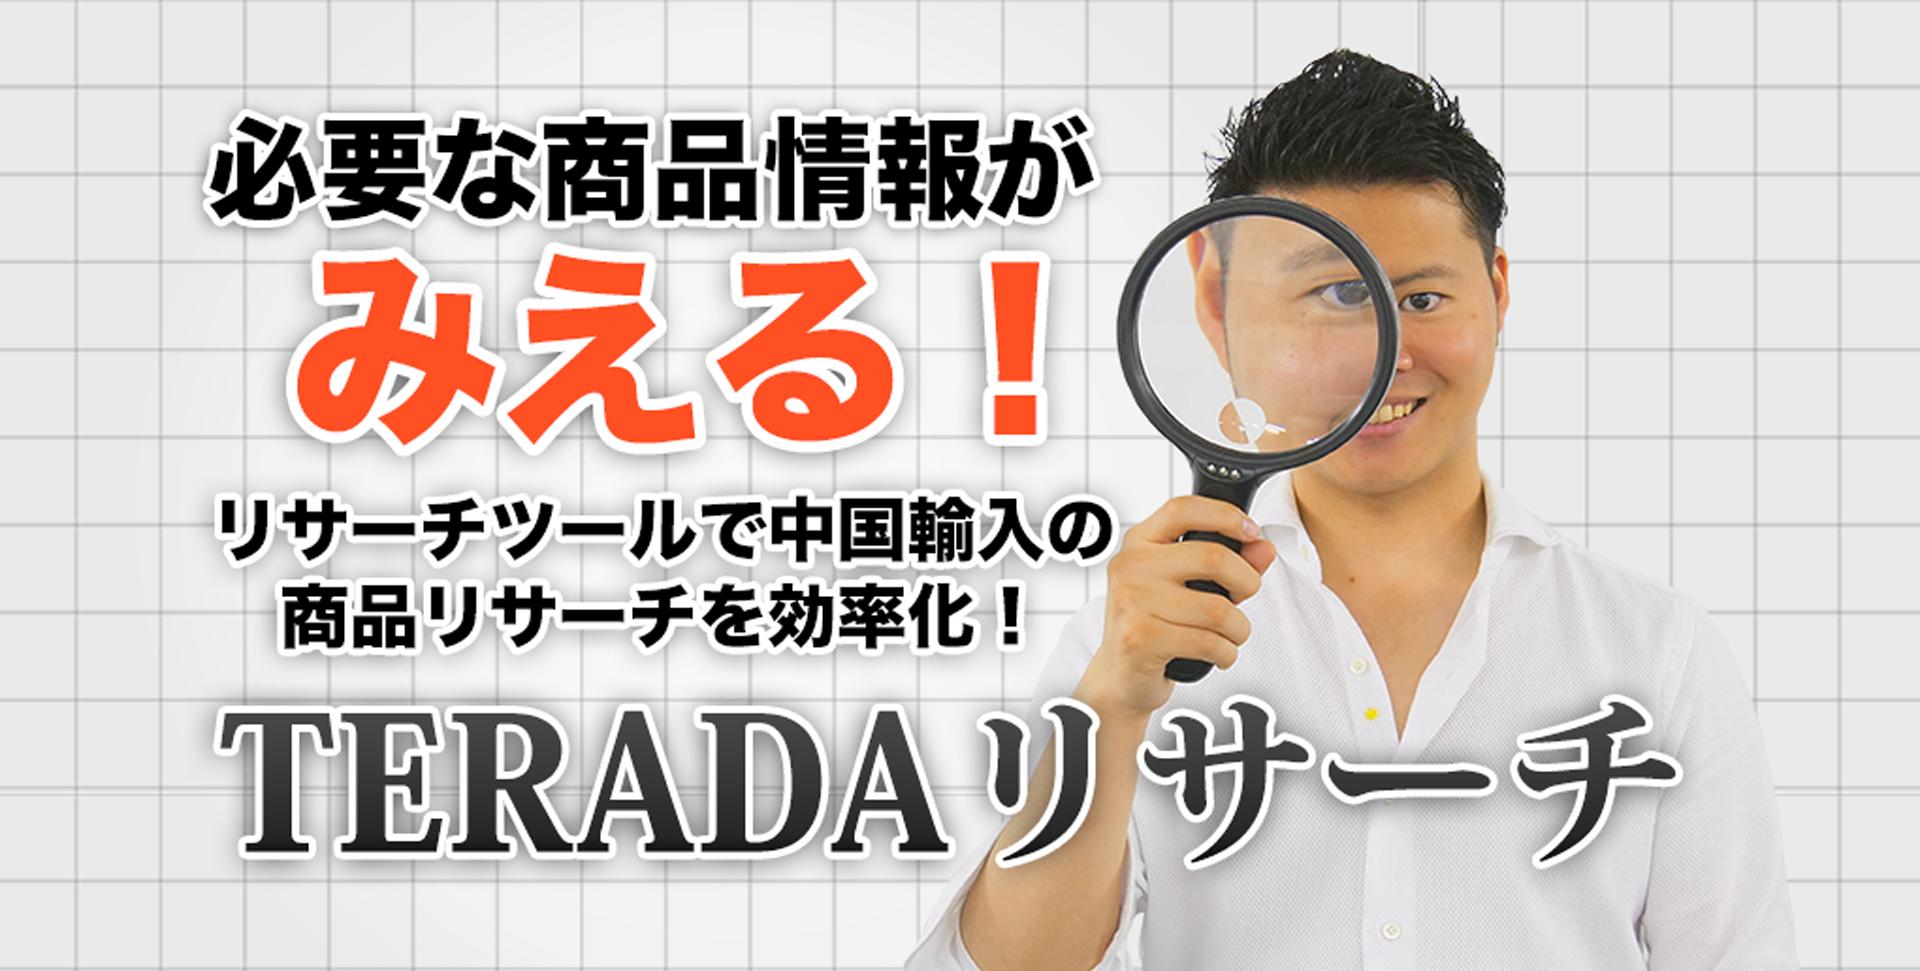 TERADAリサーチ無料版の配布を開始します!